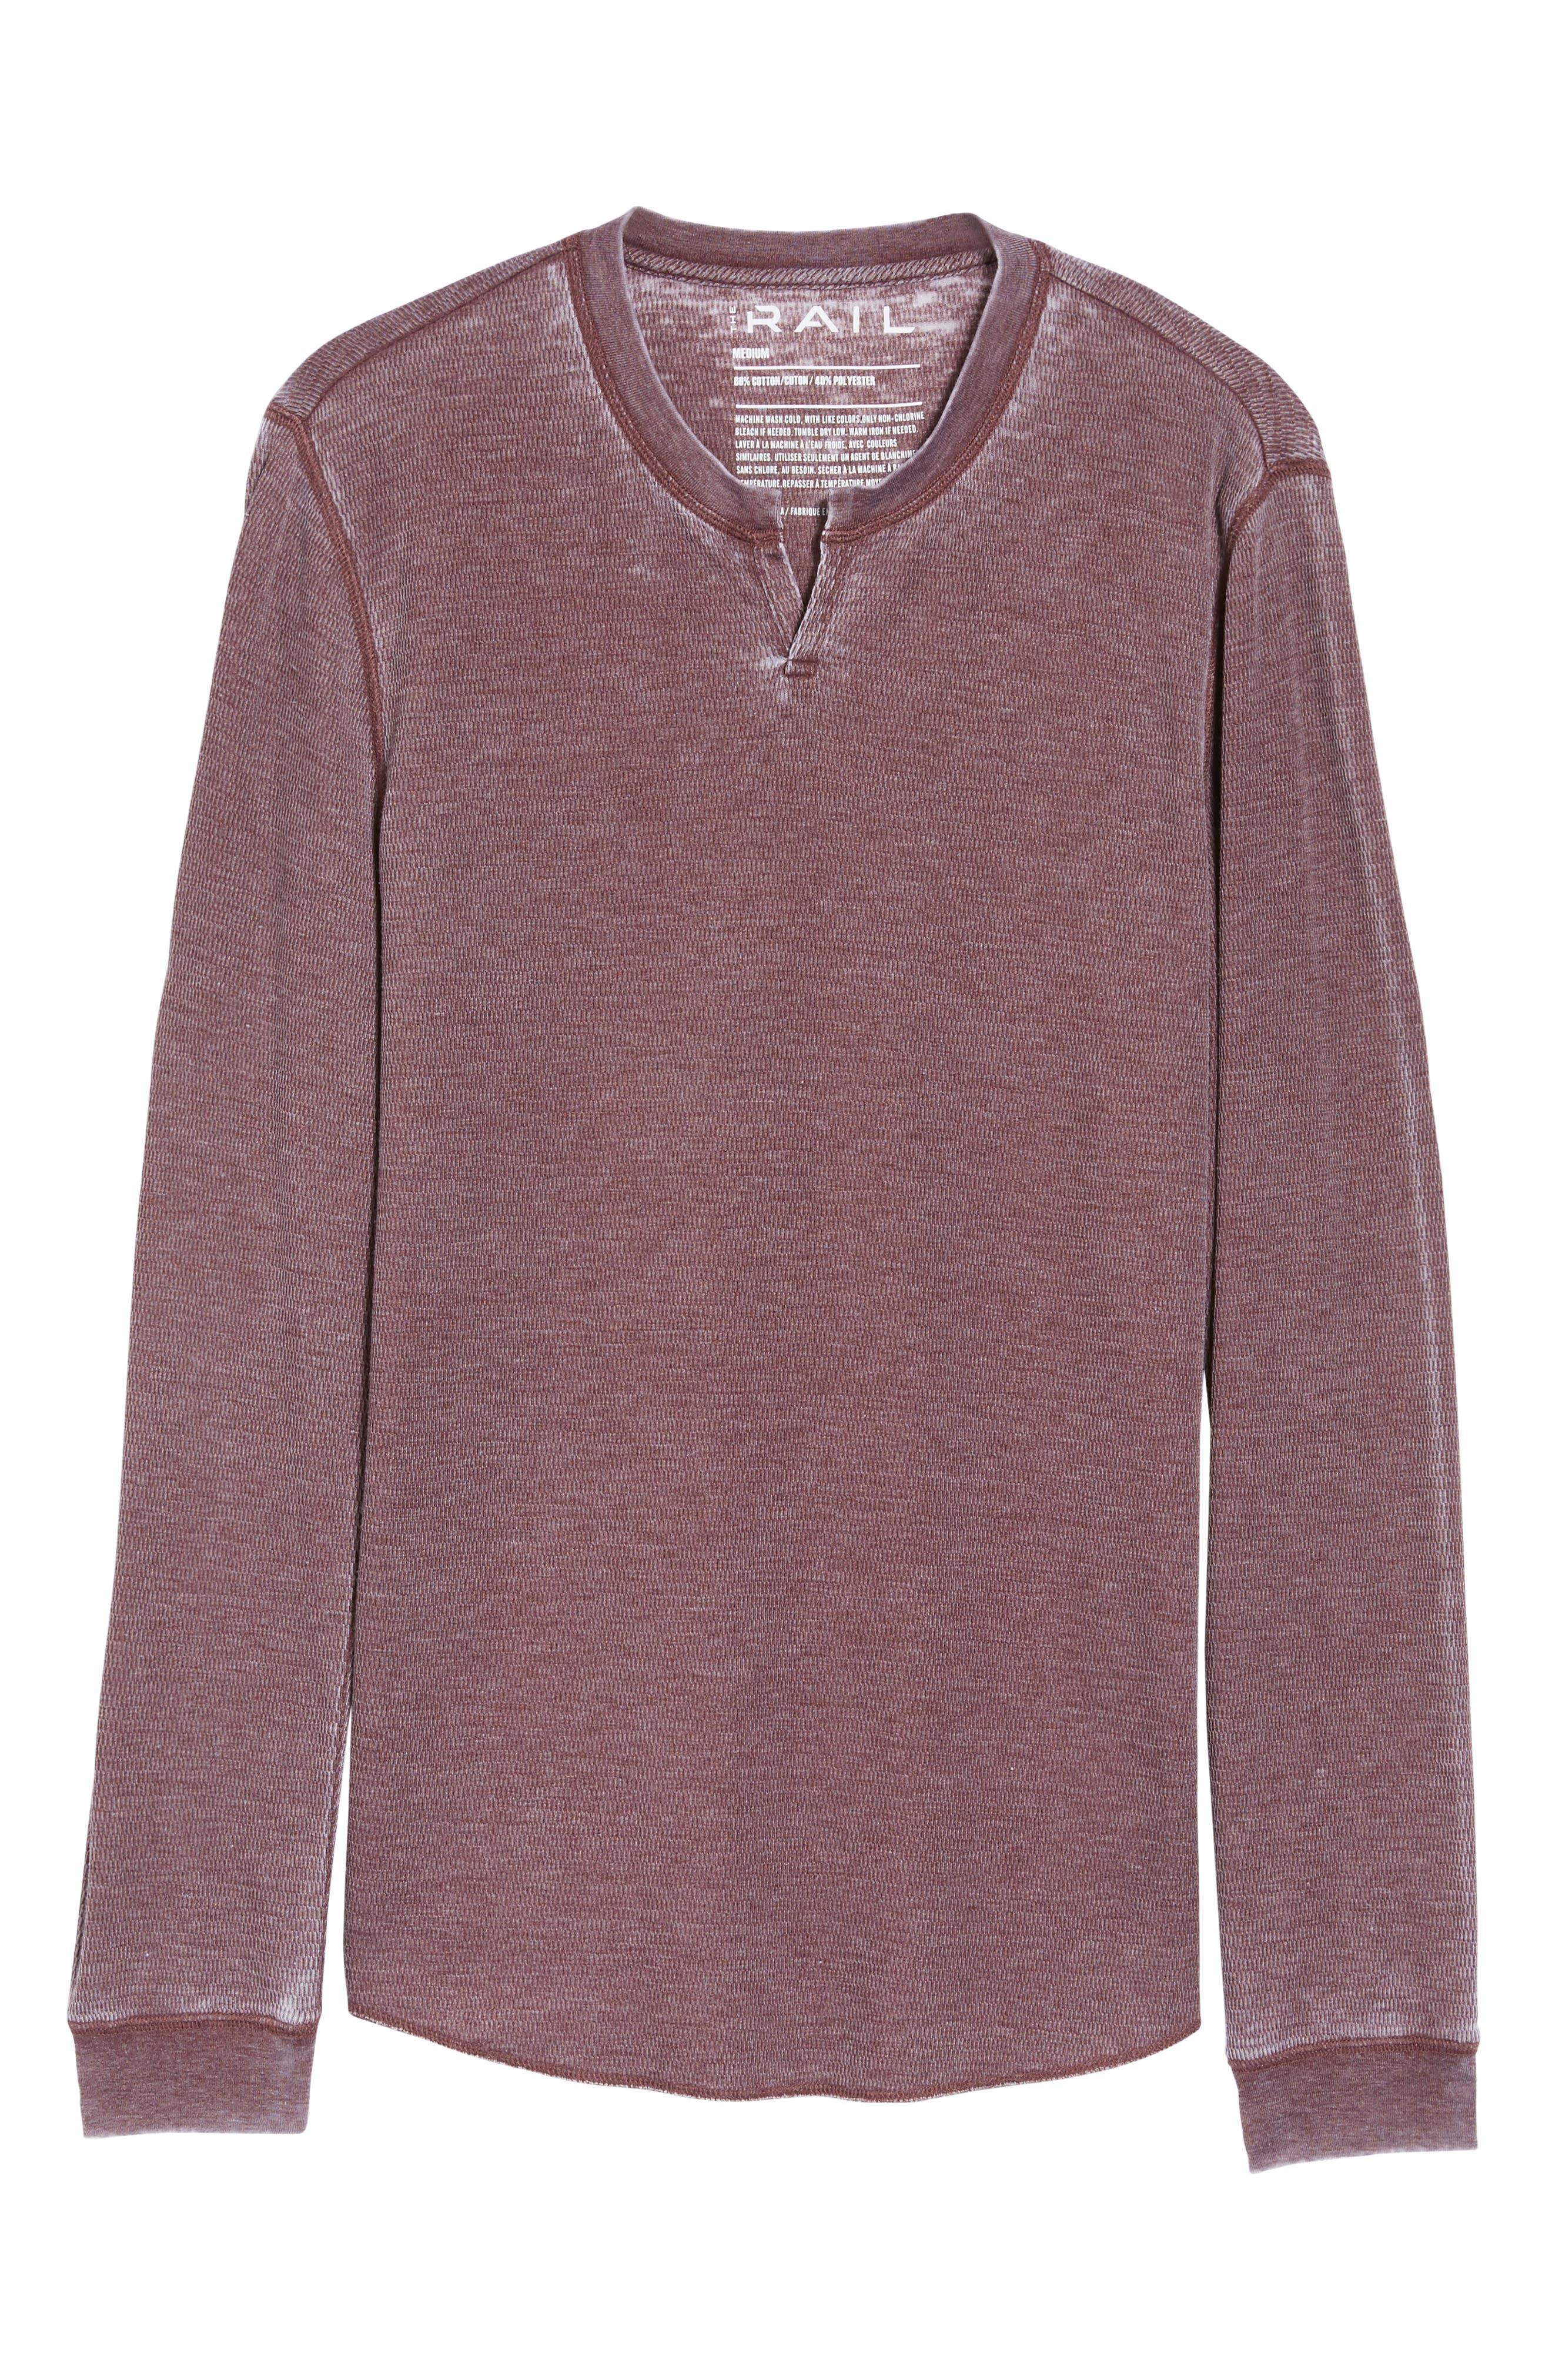 Notch Neck Thermal T-Shirt,                             Alternate thumbnail 42, color,